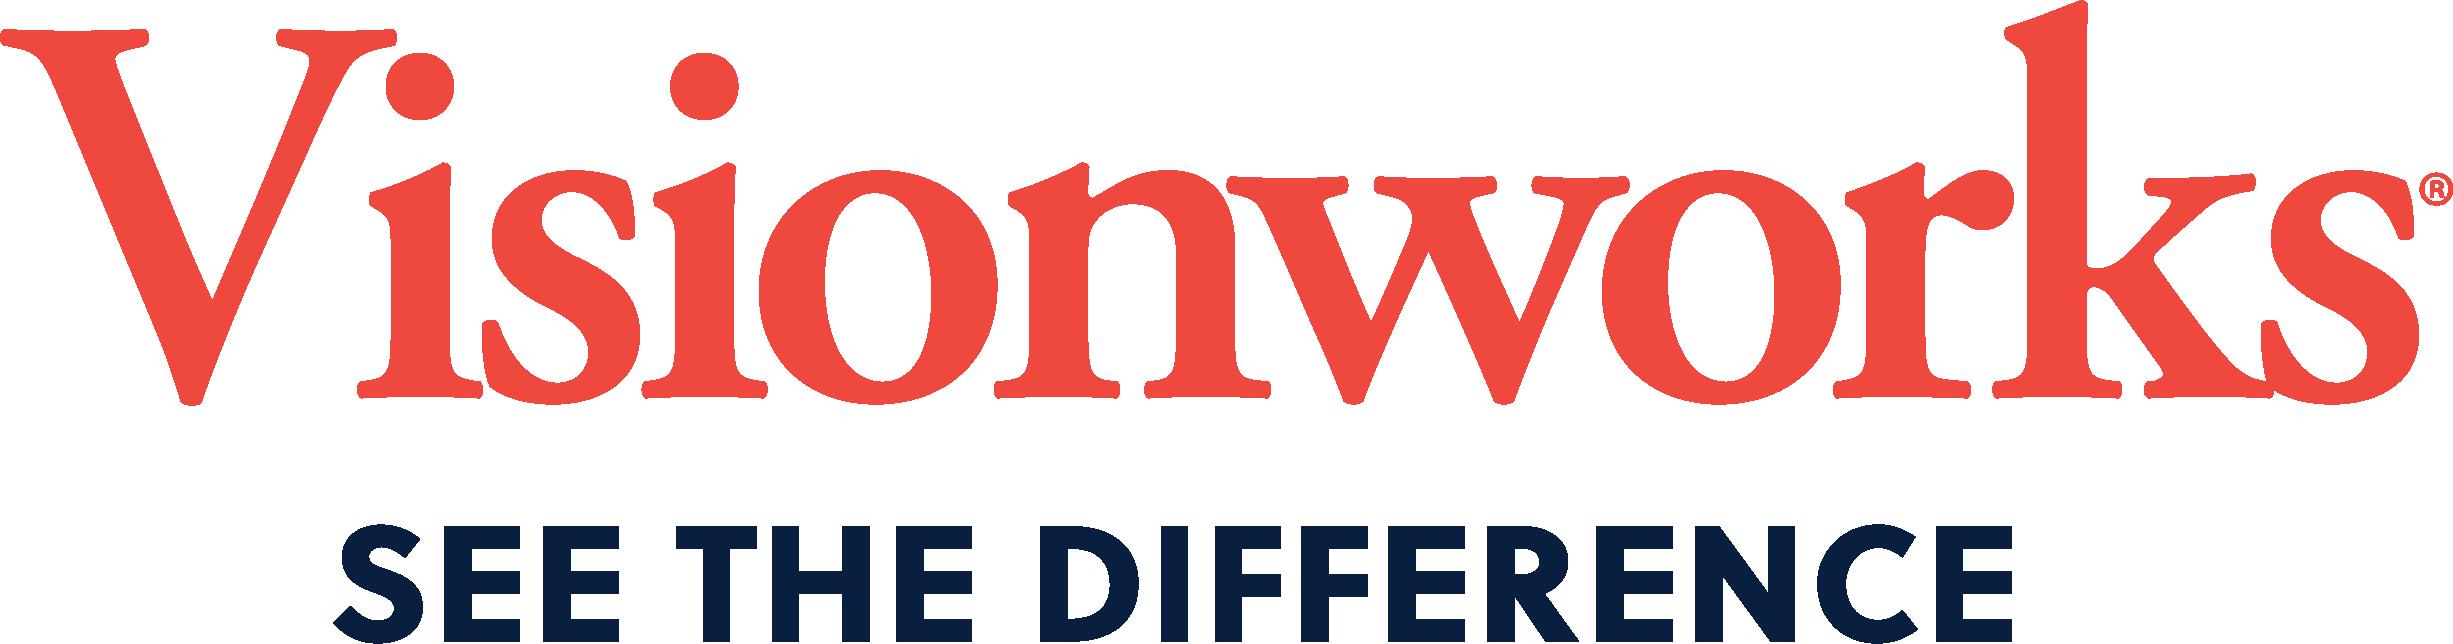 Visionworks of America, Inc. Company Logo